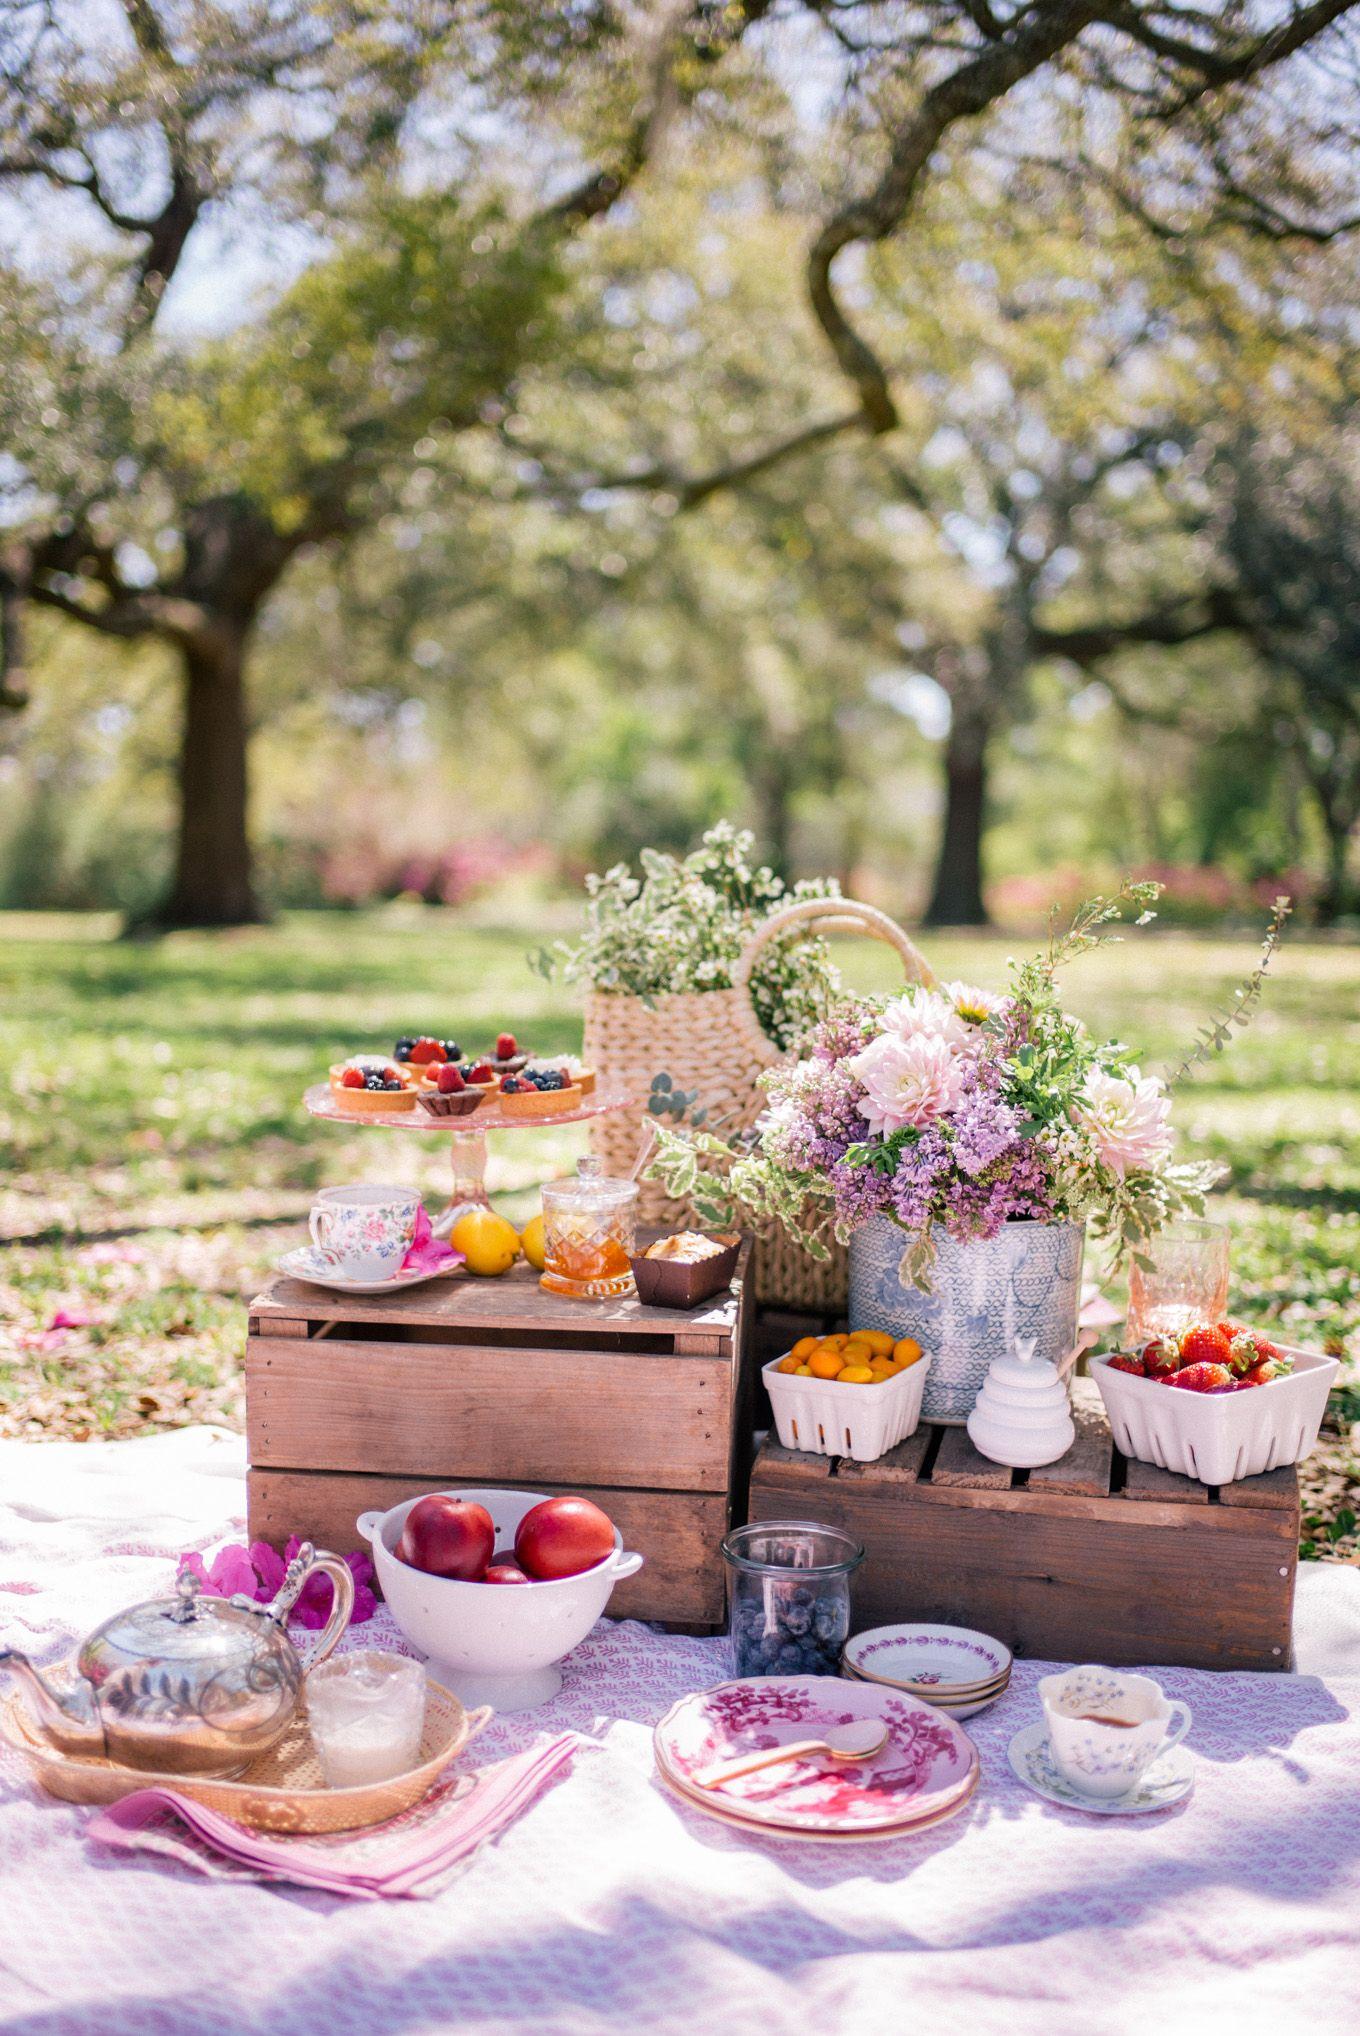 azalea tea party picnic picnic time pinterest picknick ideen vergessene orte und drau en. Black Bedroom Furniture Sets. Home Design Ideas